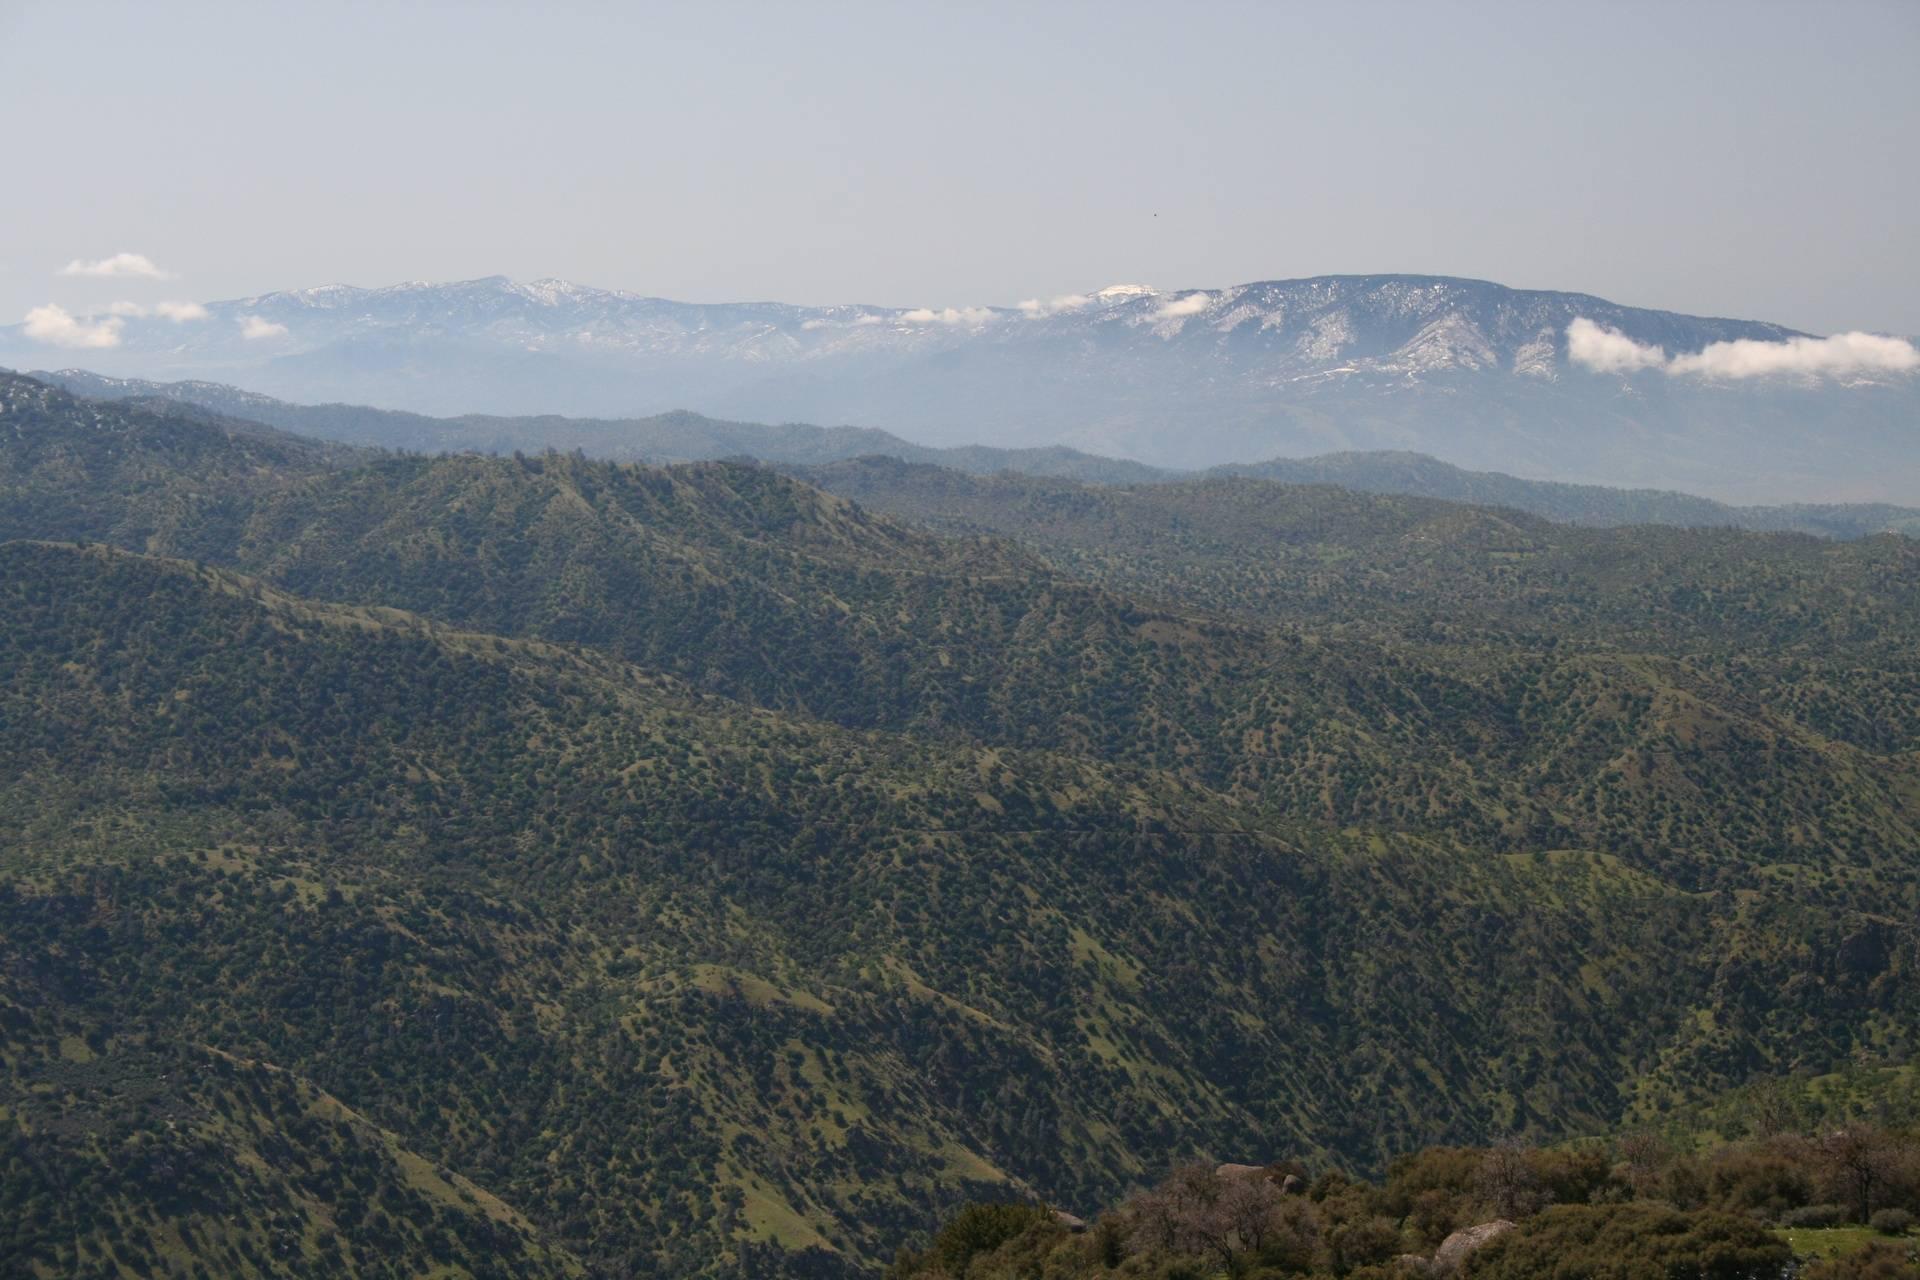 Tehahachapi Mts to left, Bear Mt to right (background)